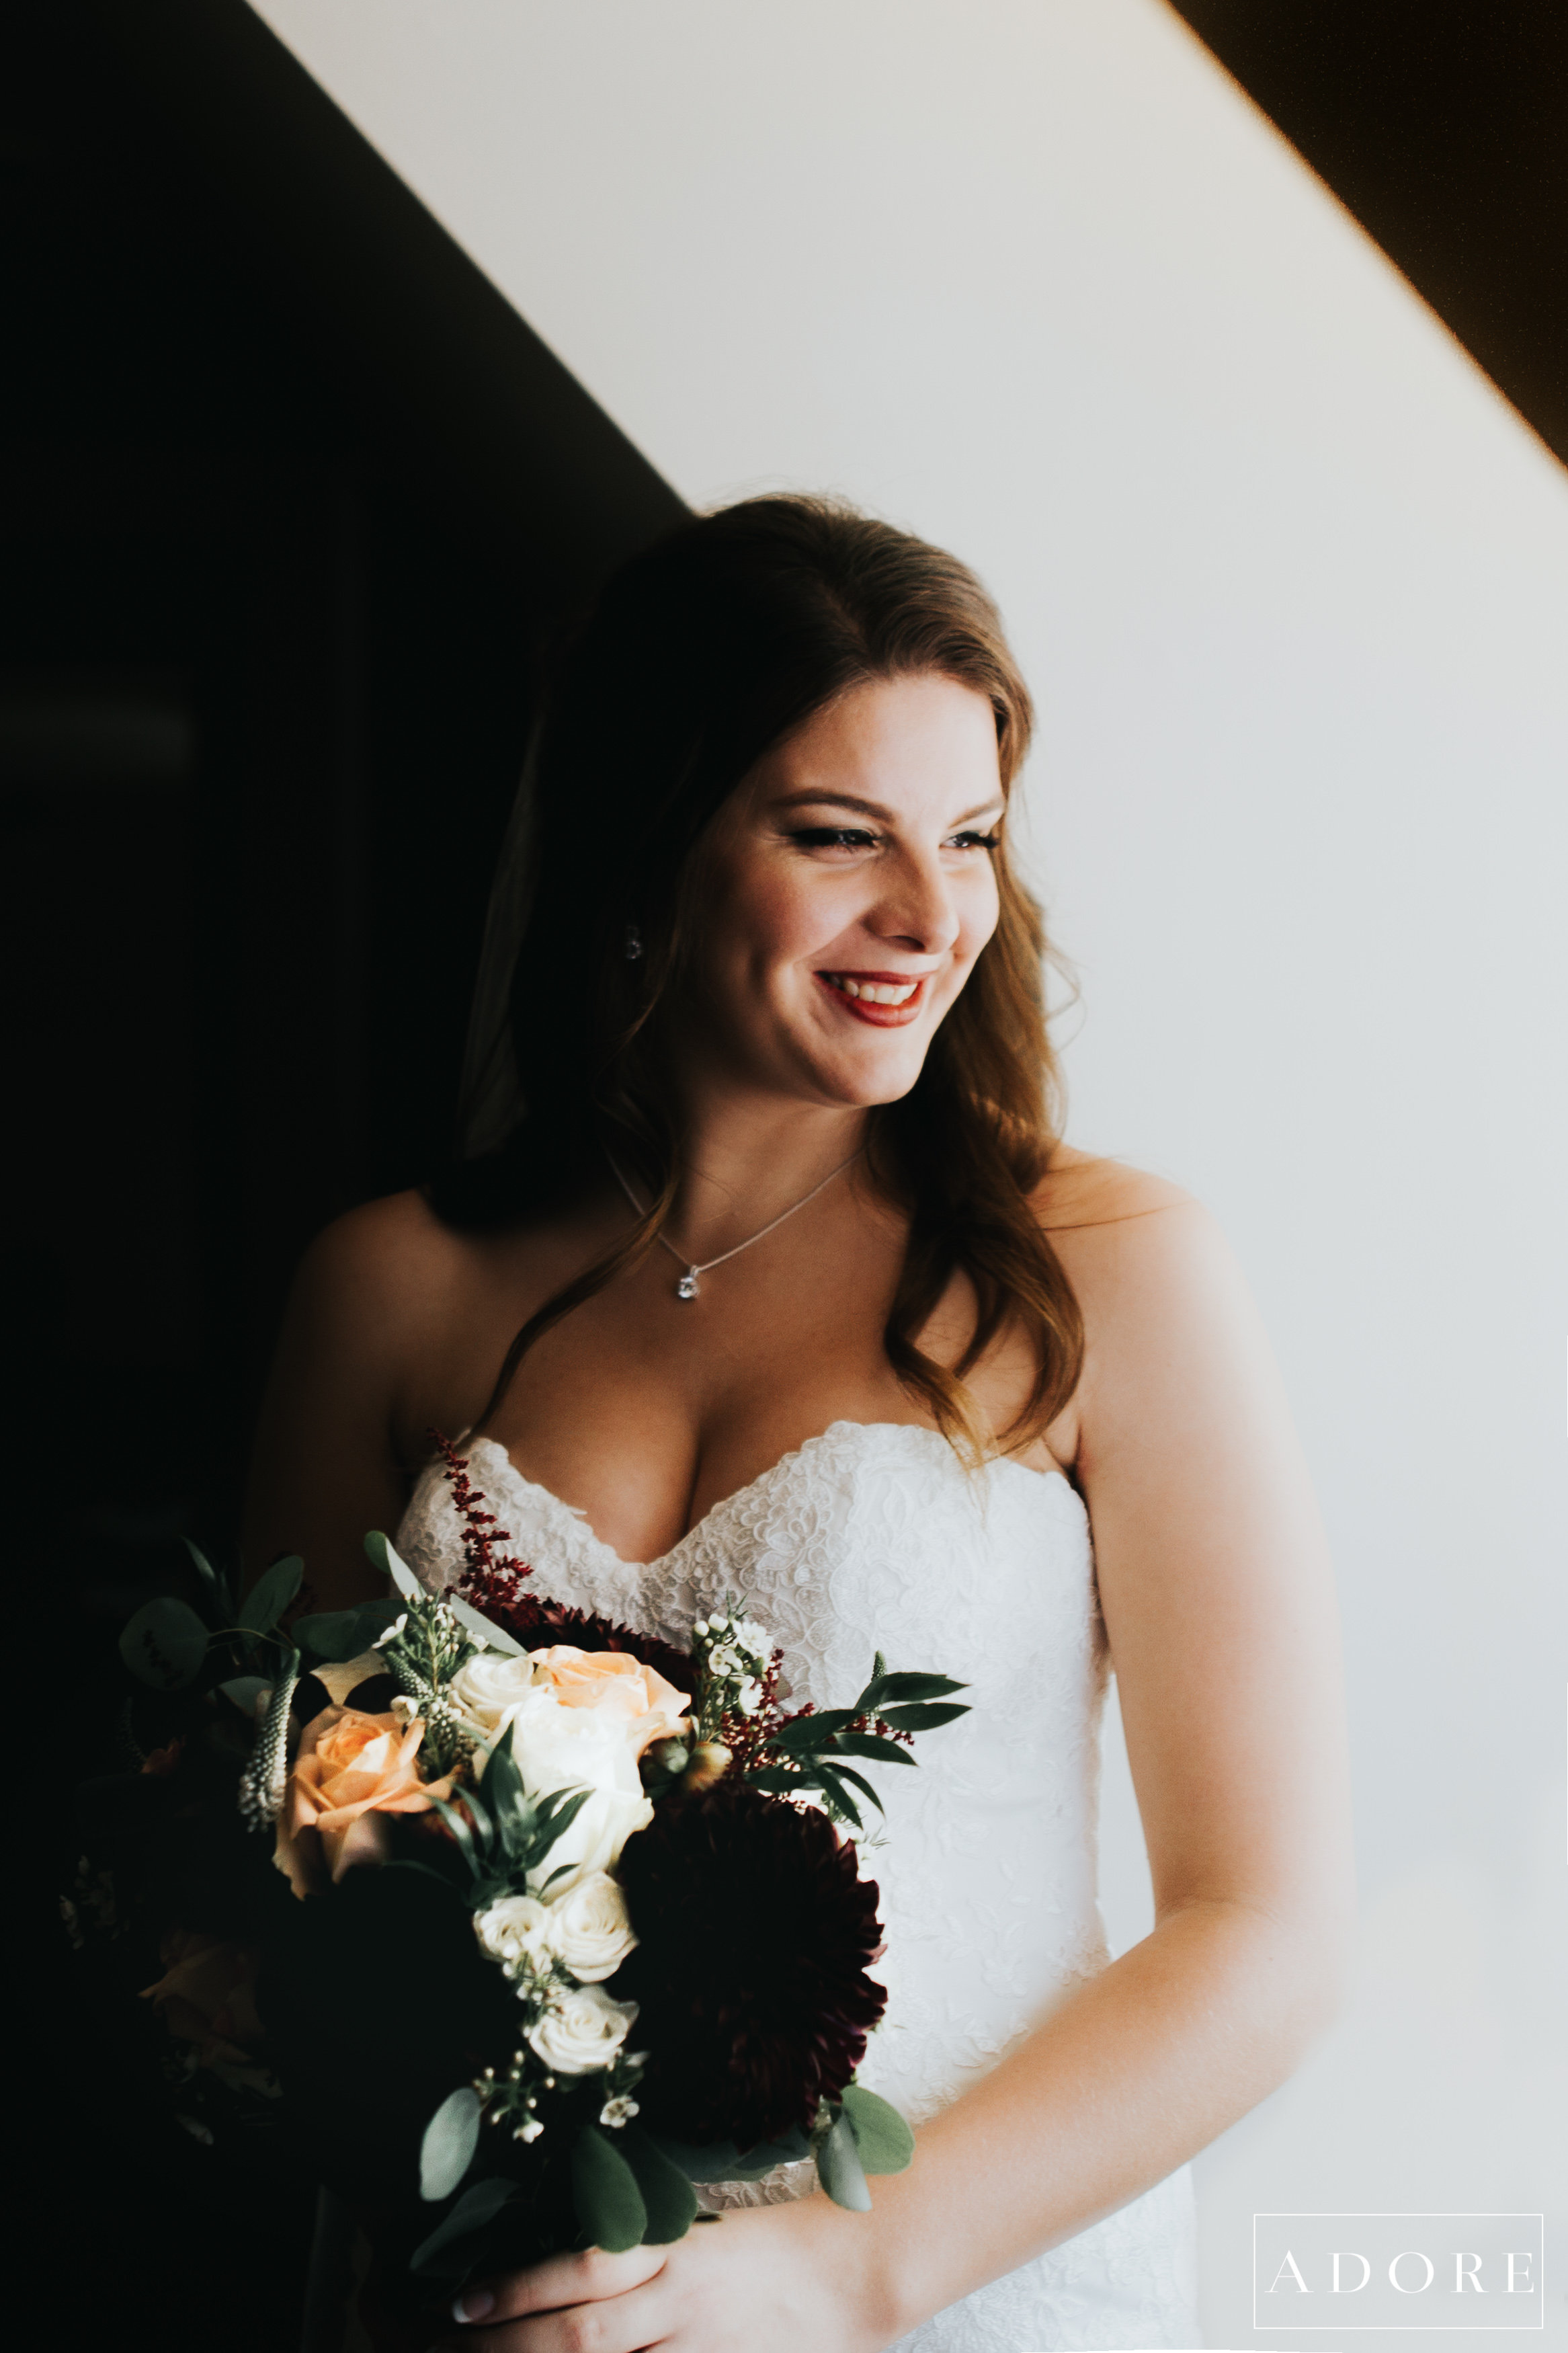 Adore Wedding Photography-15010.jpg